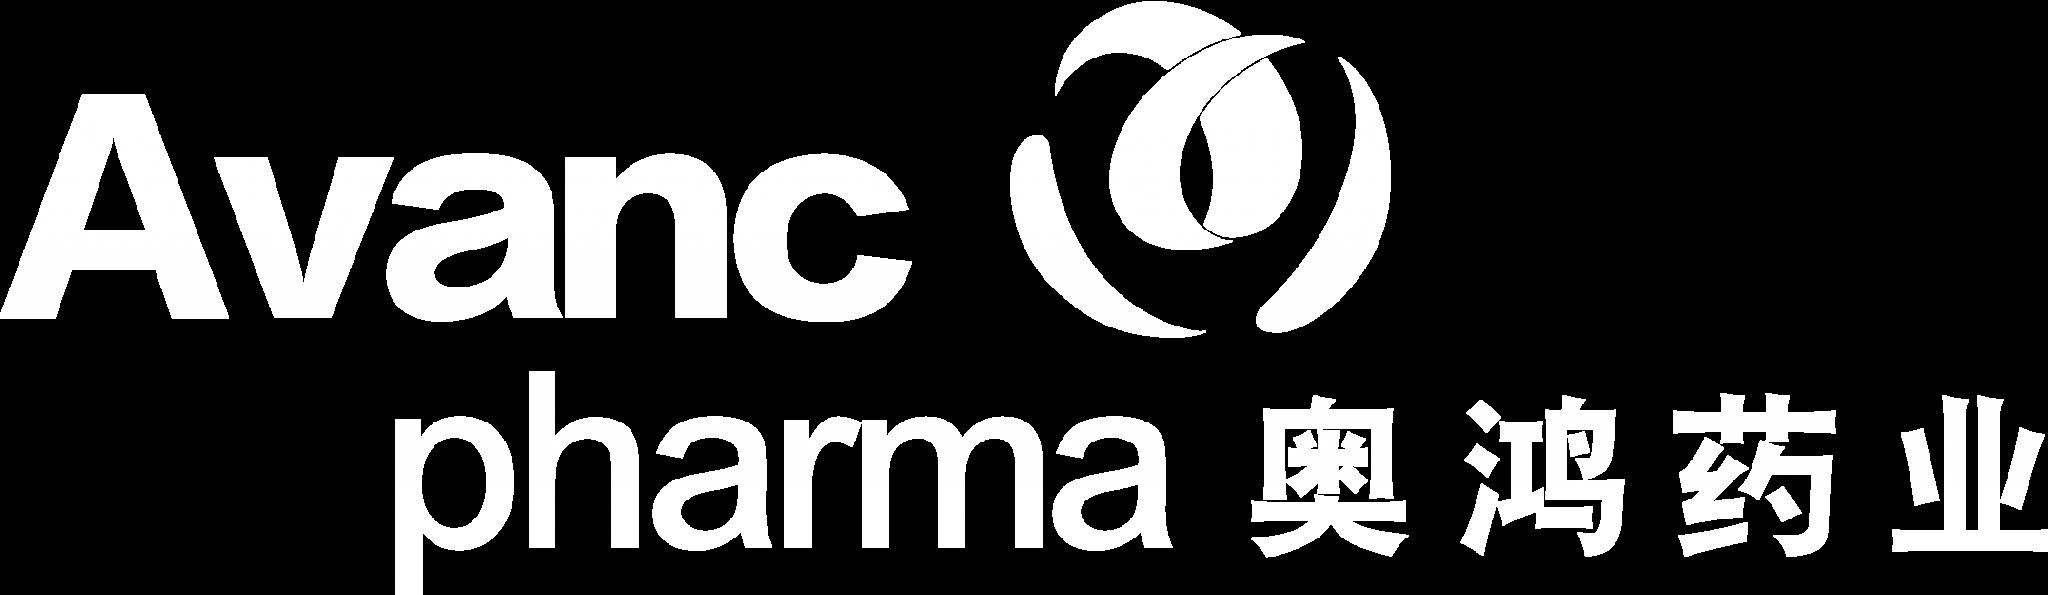 奥鸿药业 AvancPharma